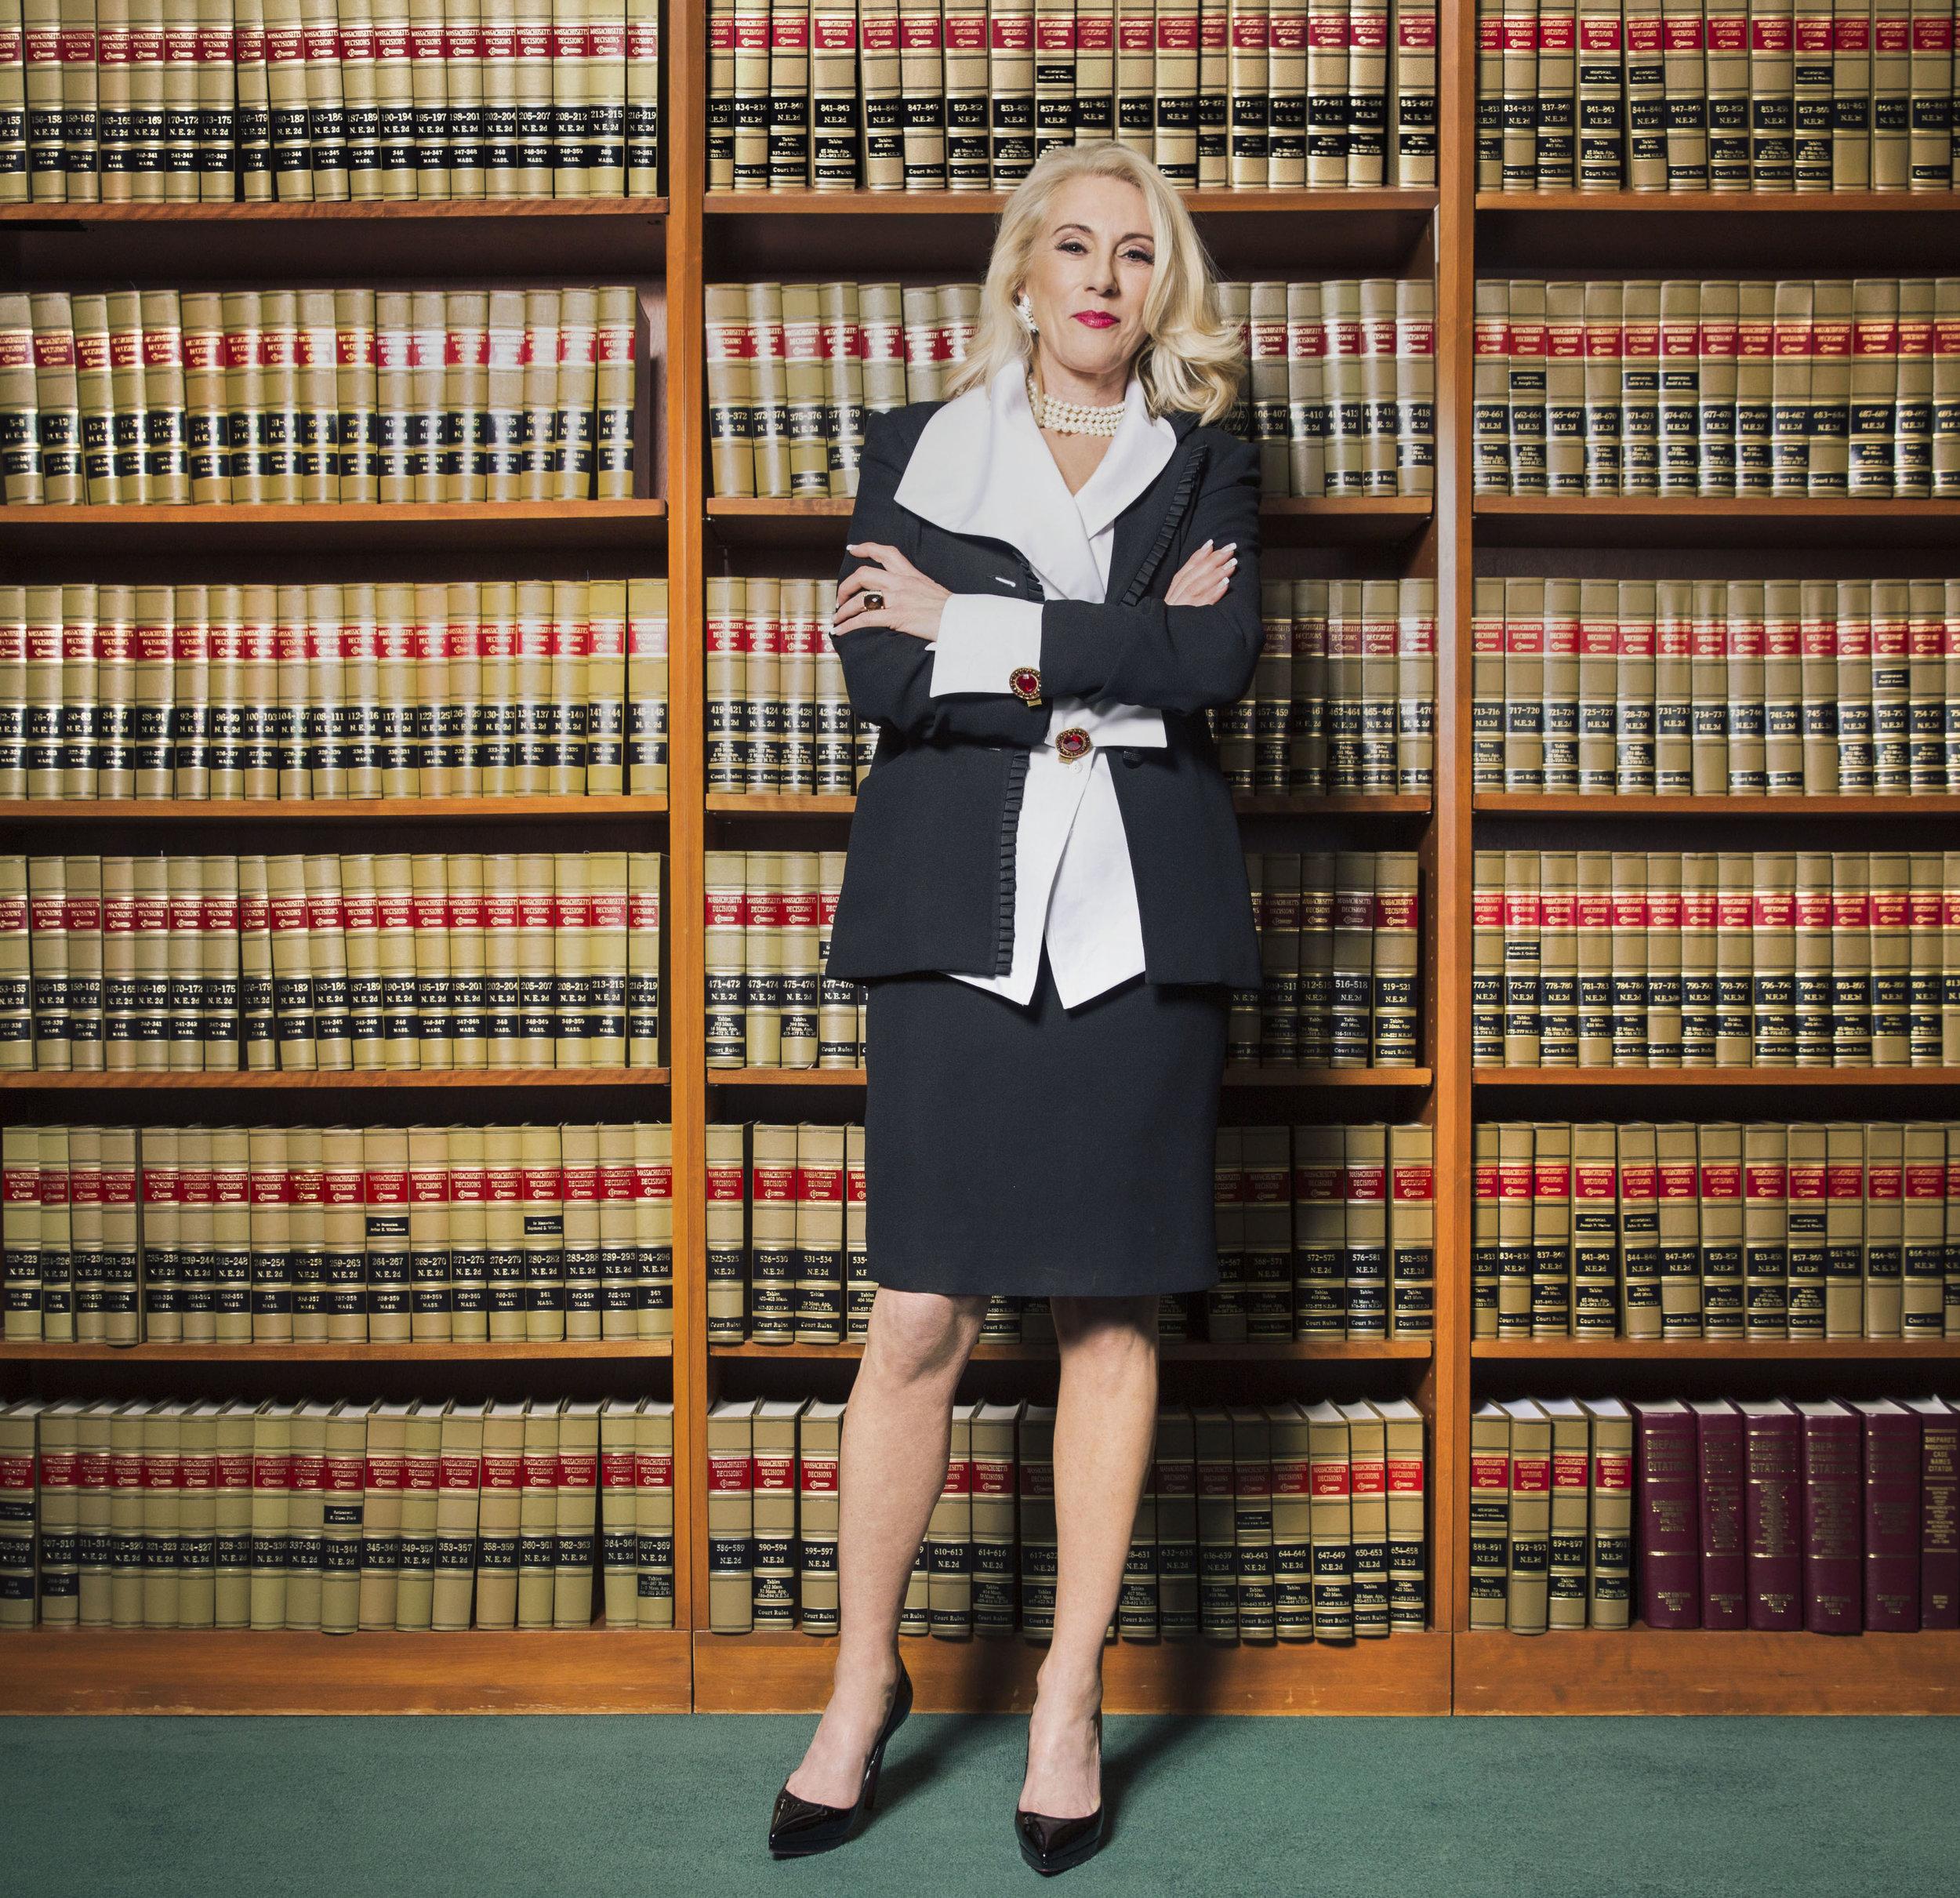 Judge headshot portrait editorial006.jpg